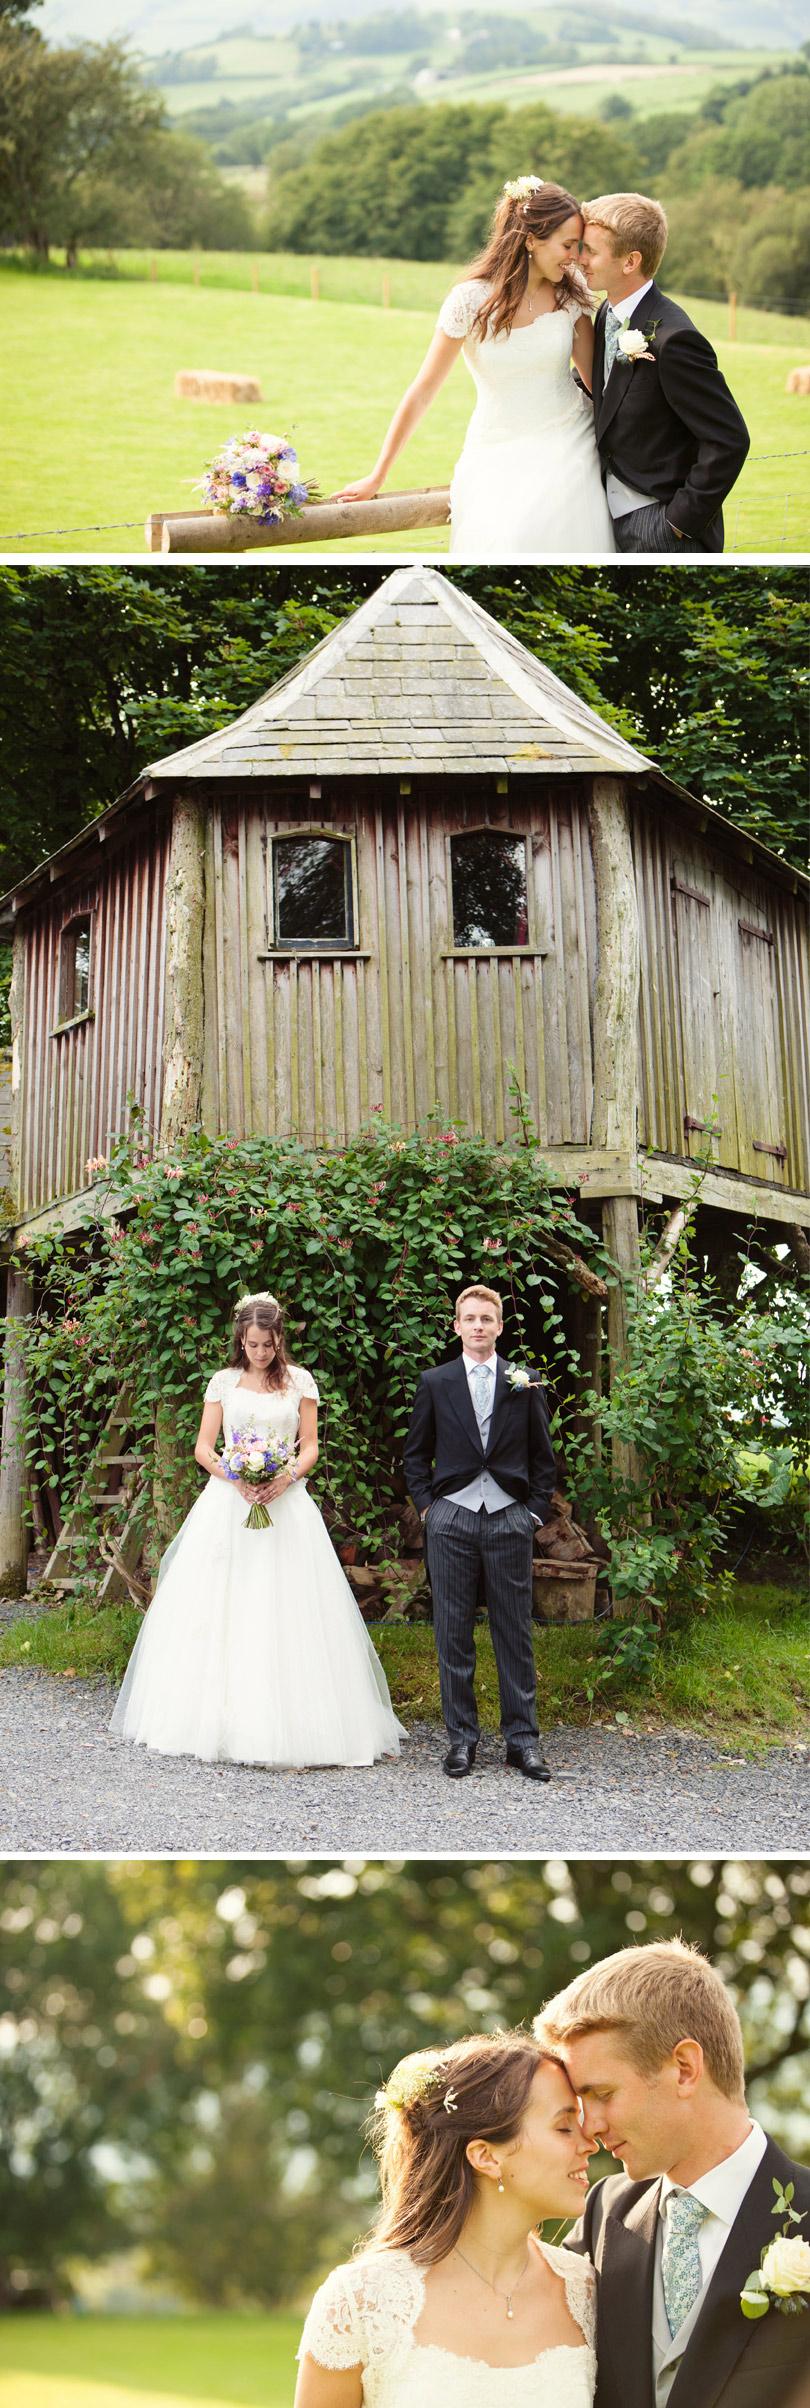 Emily&DaveS_Wales_12.jpg